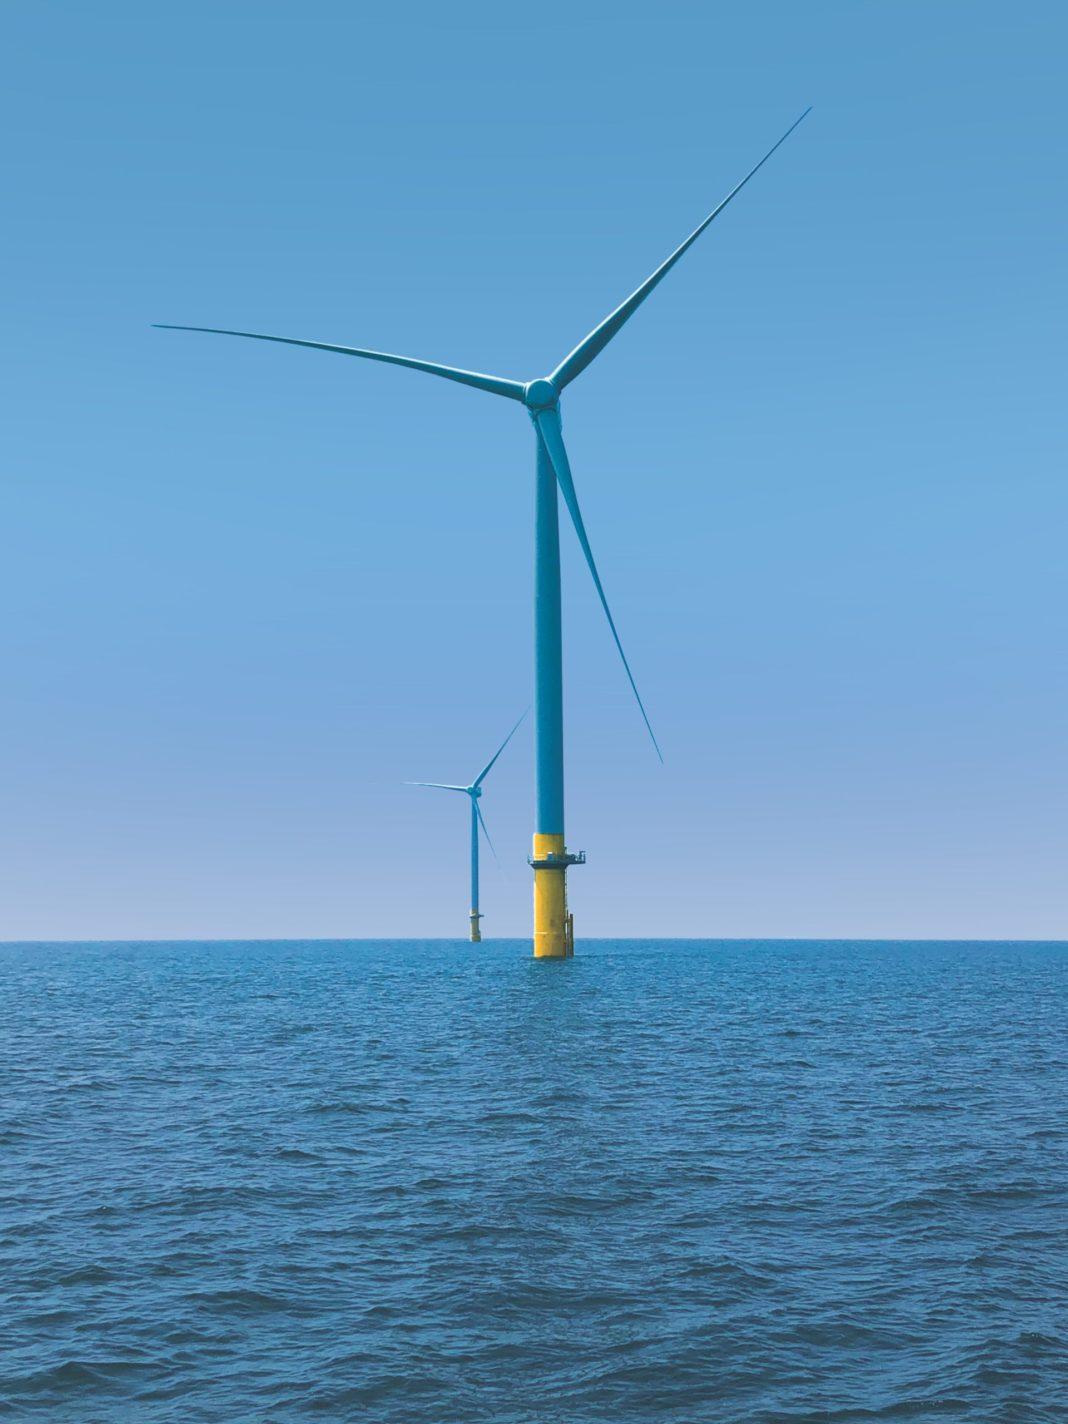 wind turbines off the coast of Virginia Beach, Virginia, in the Atlantic Ocean